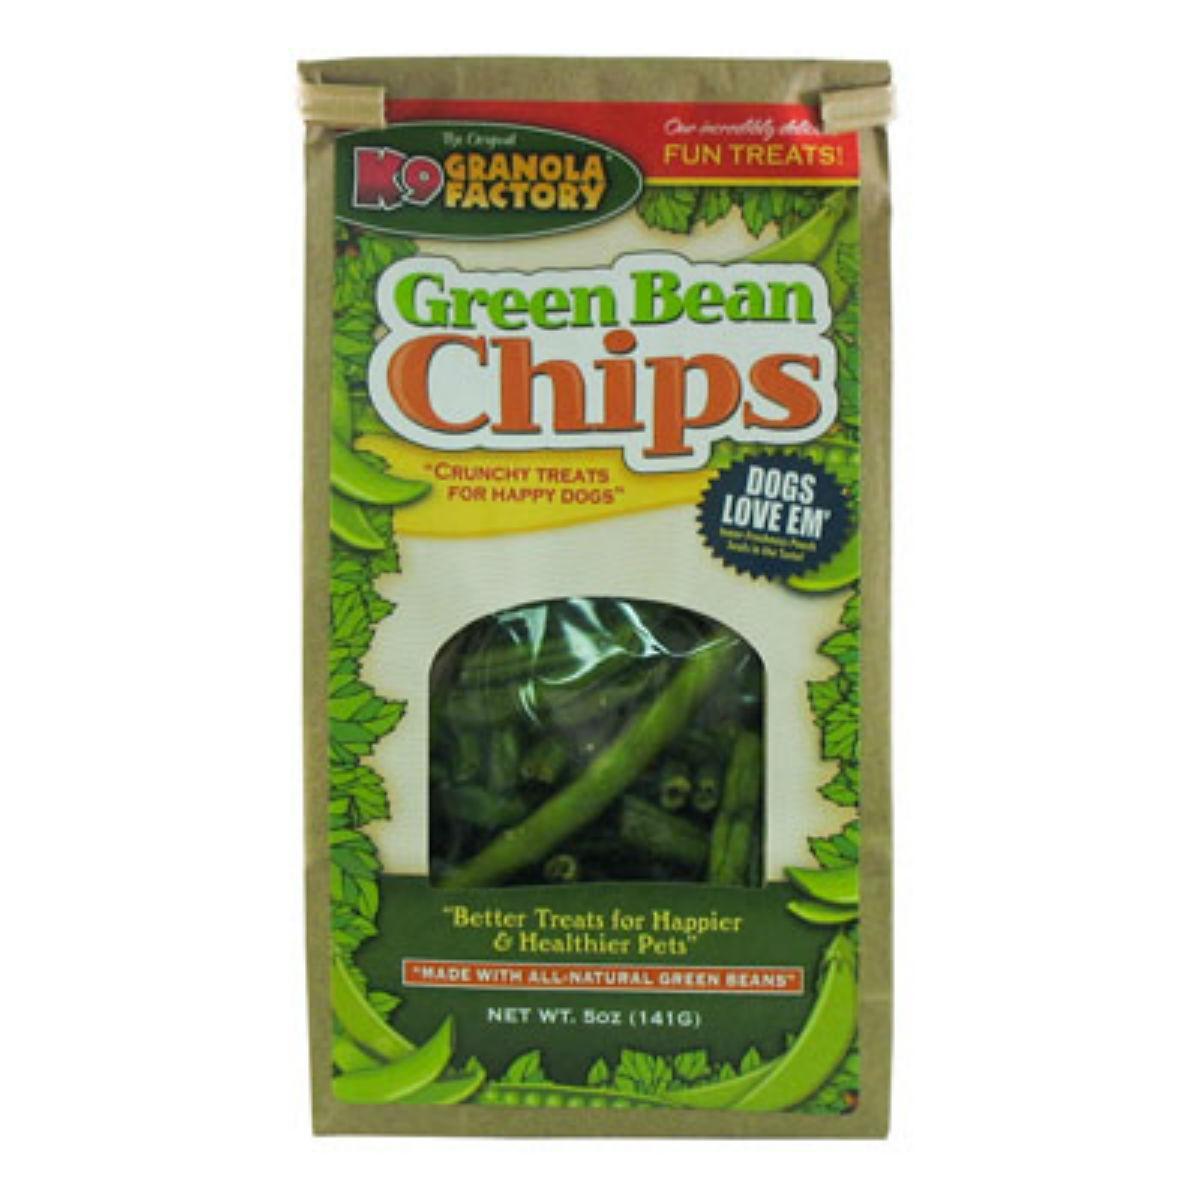 K9 Granola Factory Green Bean Chips Dog Treat by K9 Granola Factory